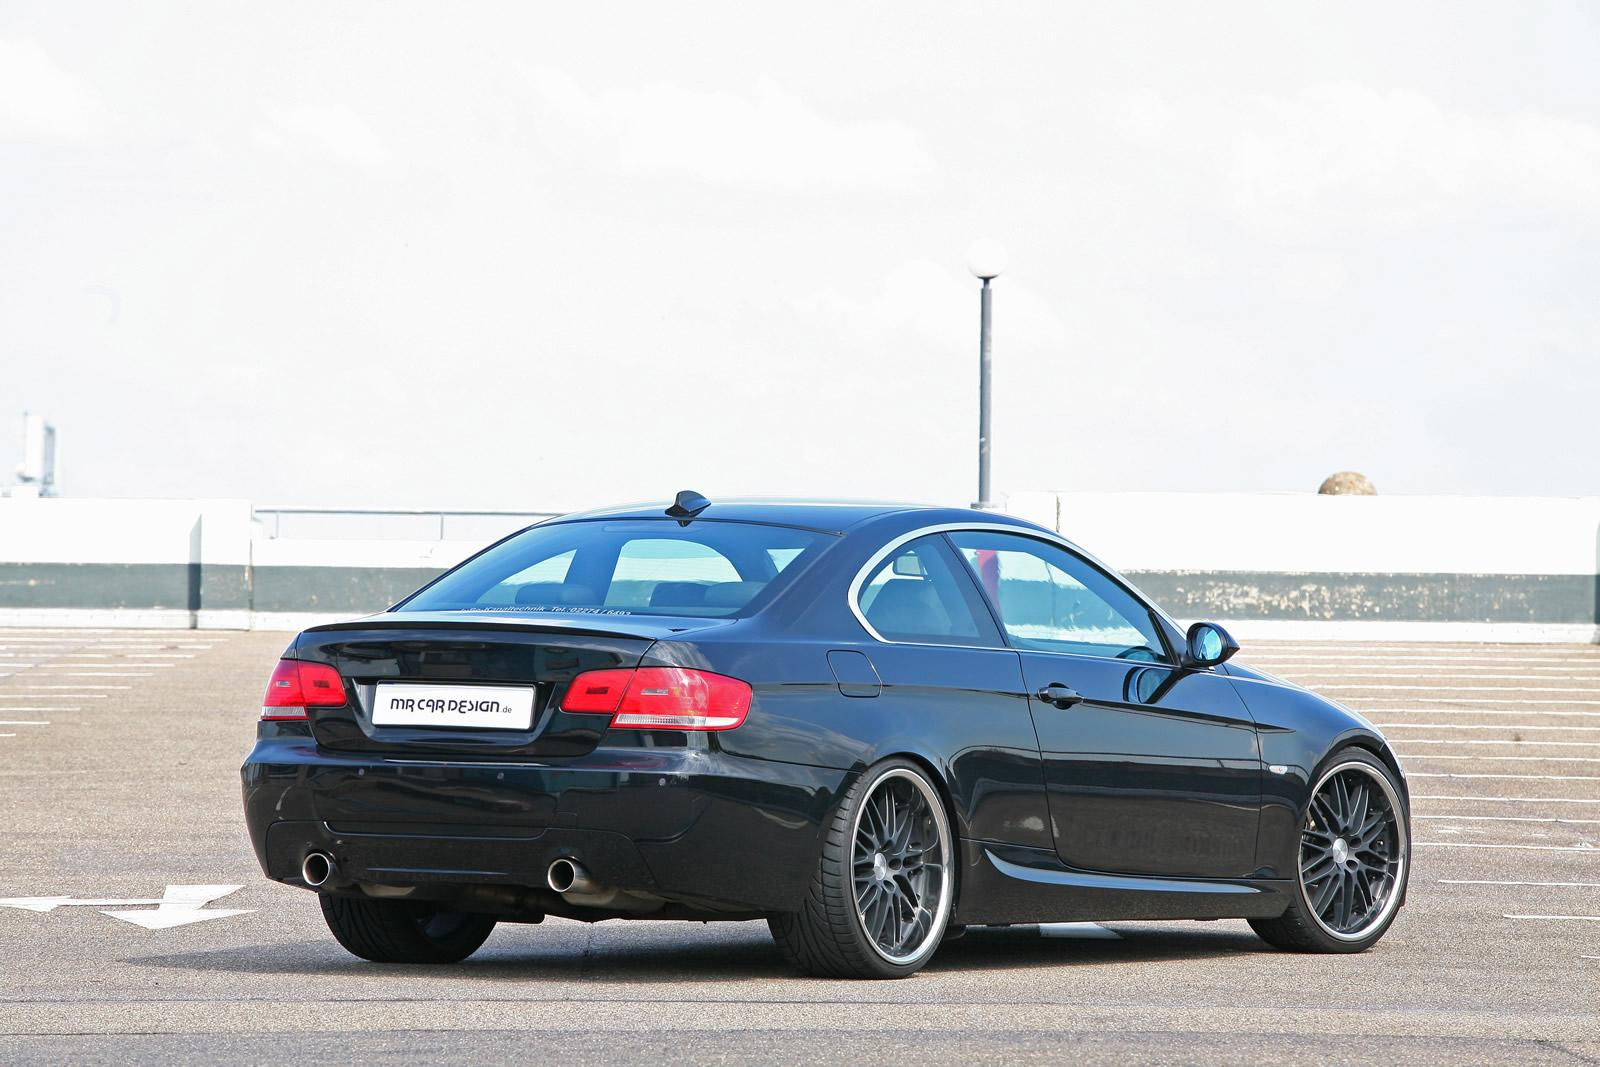 http://www.automobilesreview.com/img/mr-car-design-bmw-335i-black-scorpion/mr-car-design-bmw-335i-black-scorpion-05.jpg